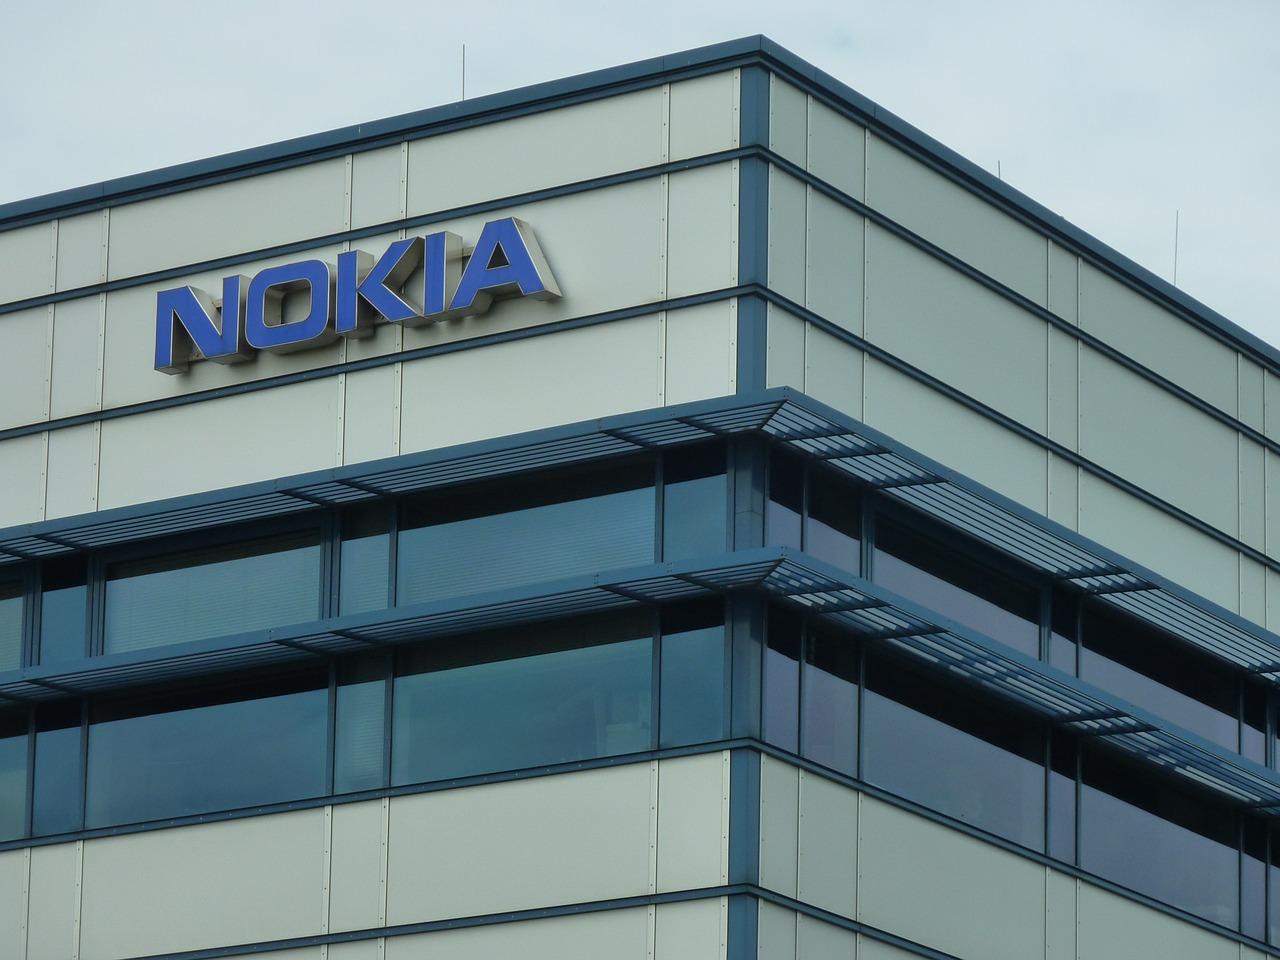 Image of Nokia Building